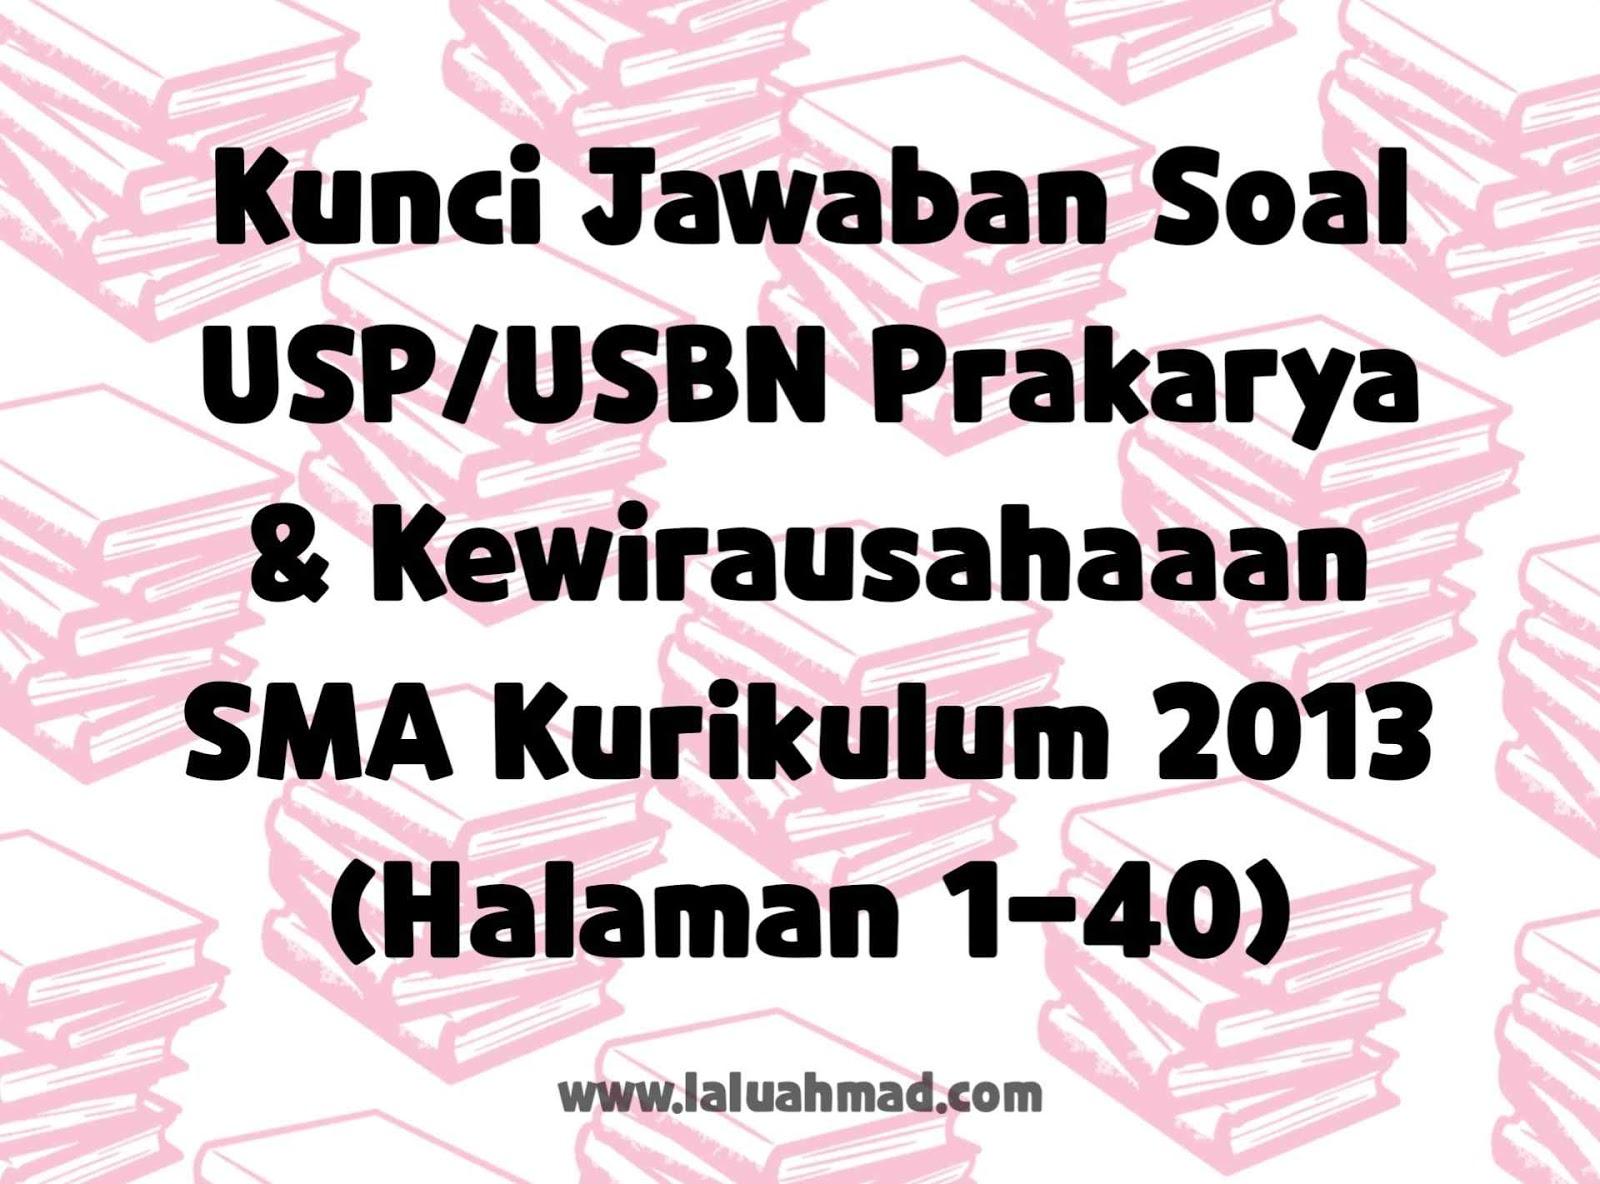 Kunci Jawaban Soal USP/USBN Prakarya & Kewirausahaaan SMA Kurikulum 2013 (Halaman 1-40)